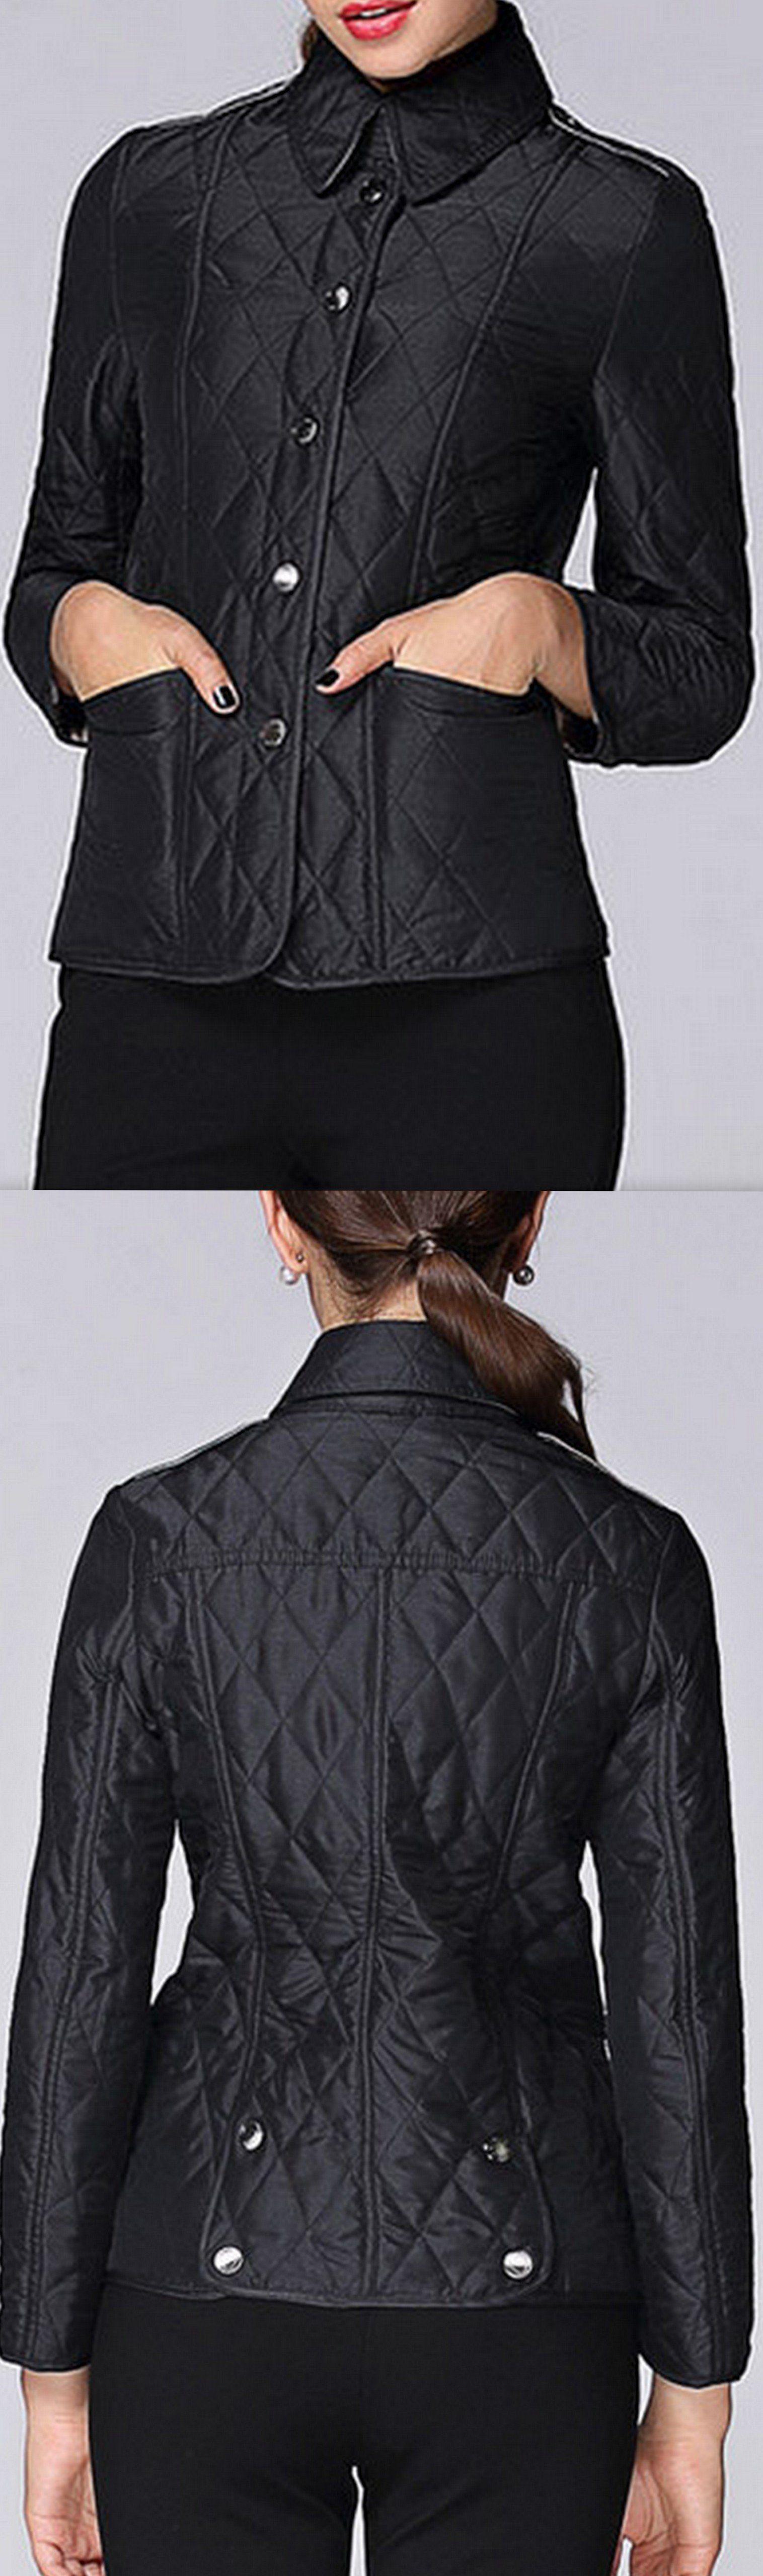 Diamond Quilted Jacket, Black or Khaki | Diamond quilt, Quilted ... : quilted designer jackets - Adamdwight.com